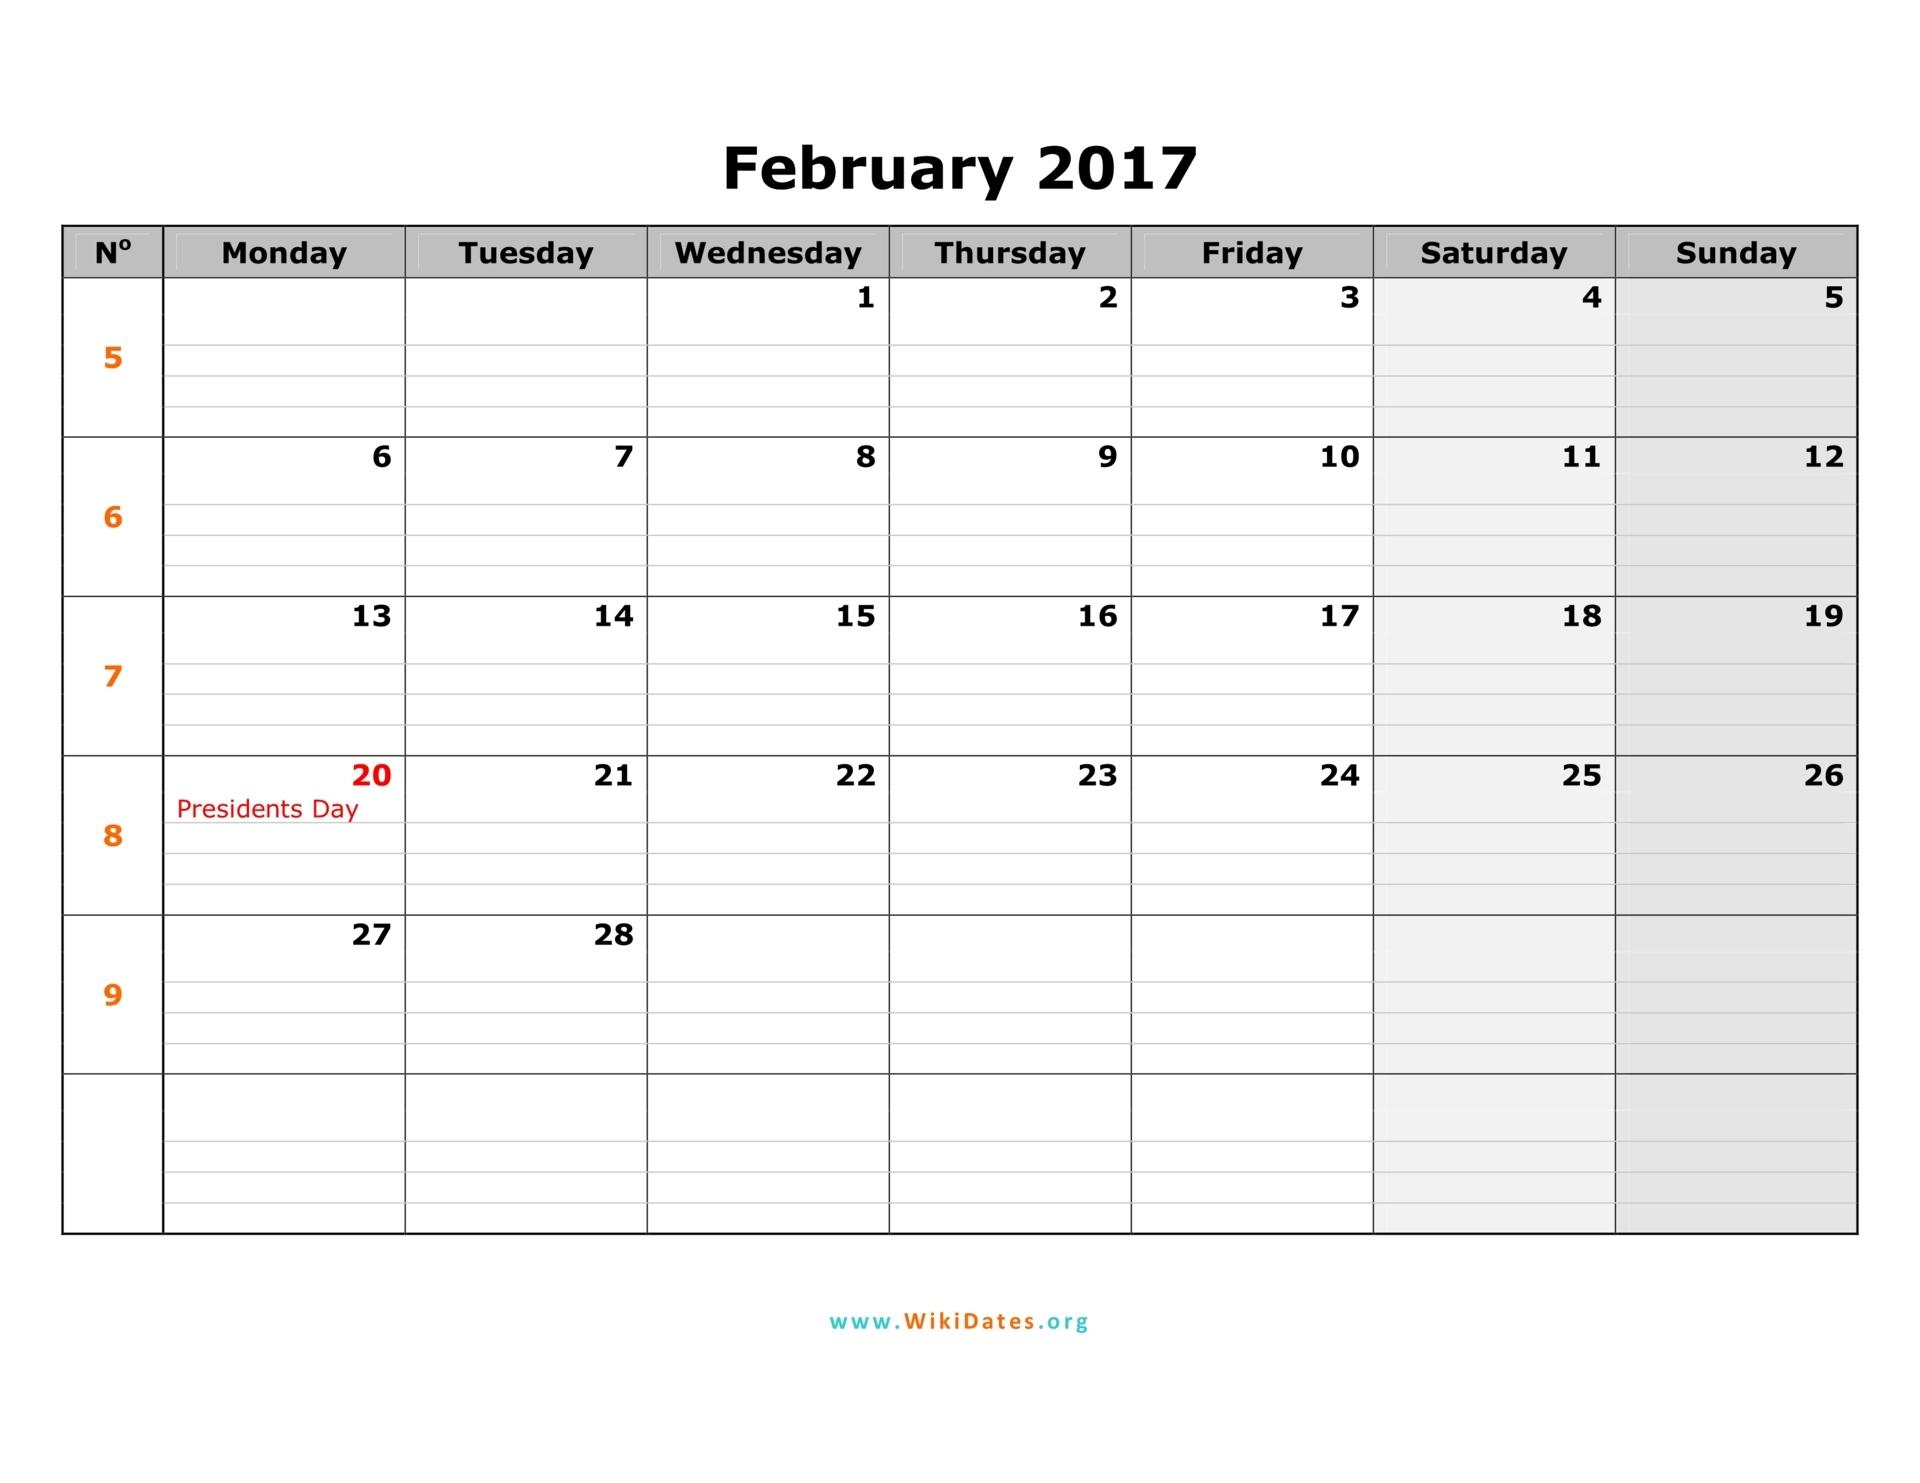 February 2017 Calendar | WikiDates.org